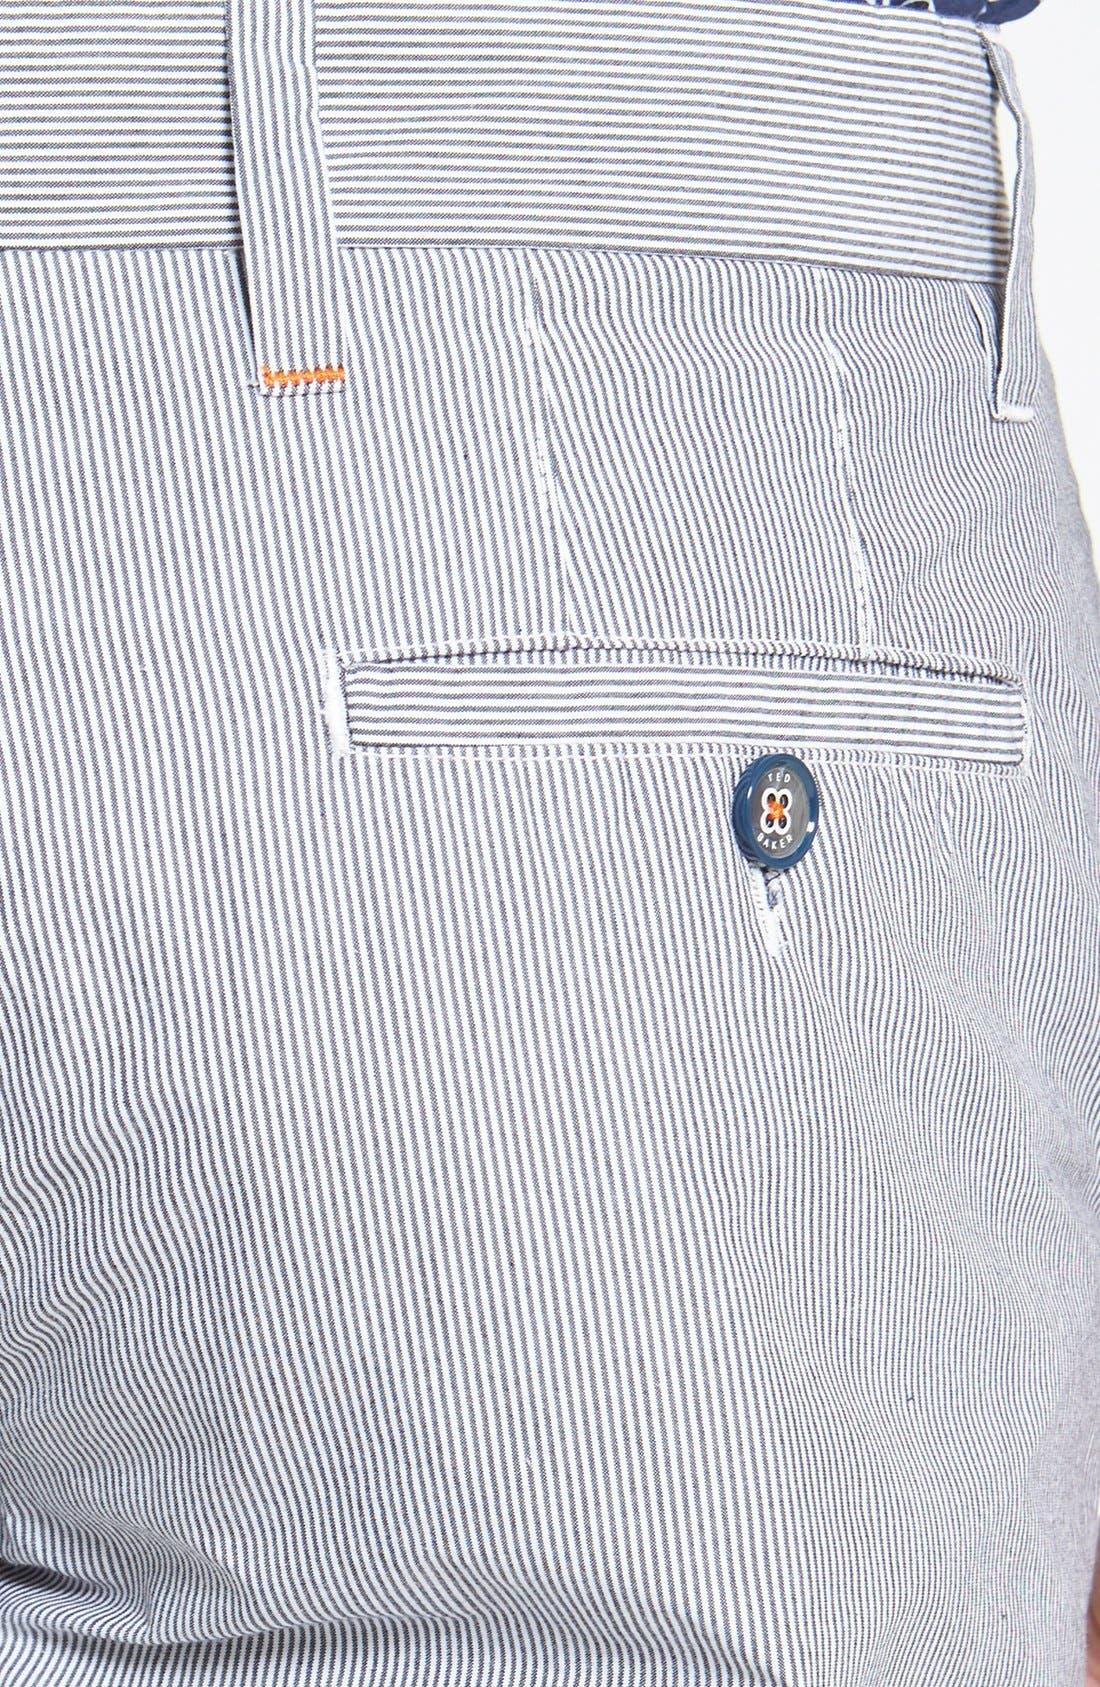 Alternate Image 3  - Ted Baker London 'Staddle' Slim Fit Stripe Shorts